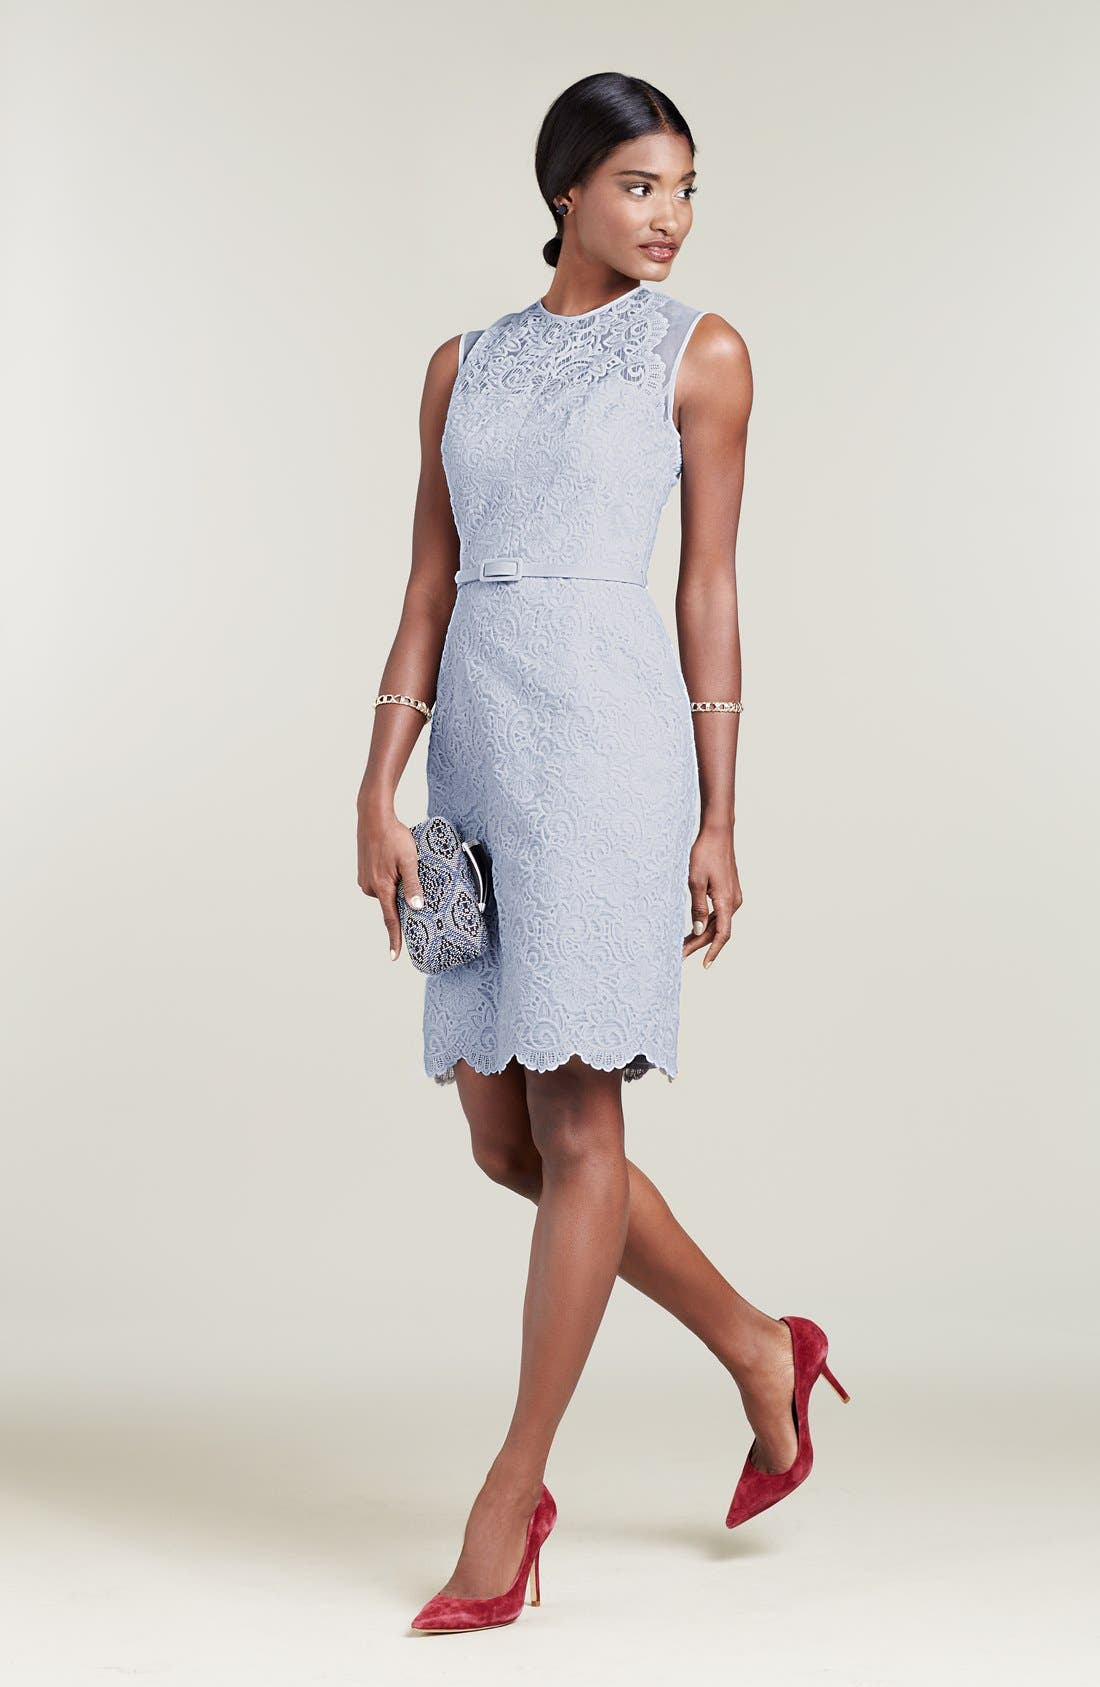 Main Image - Maggy London Sheath Dress & Accessories